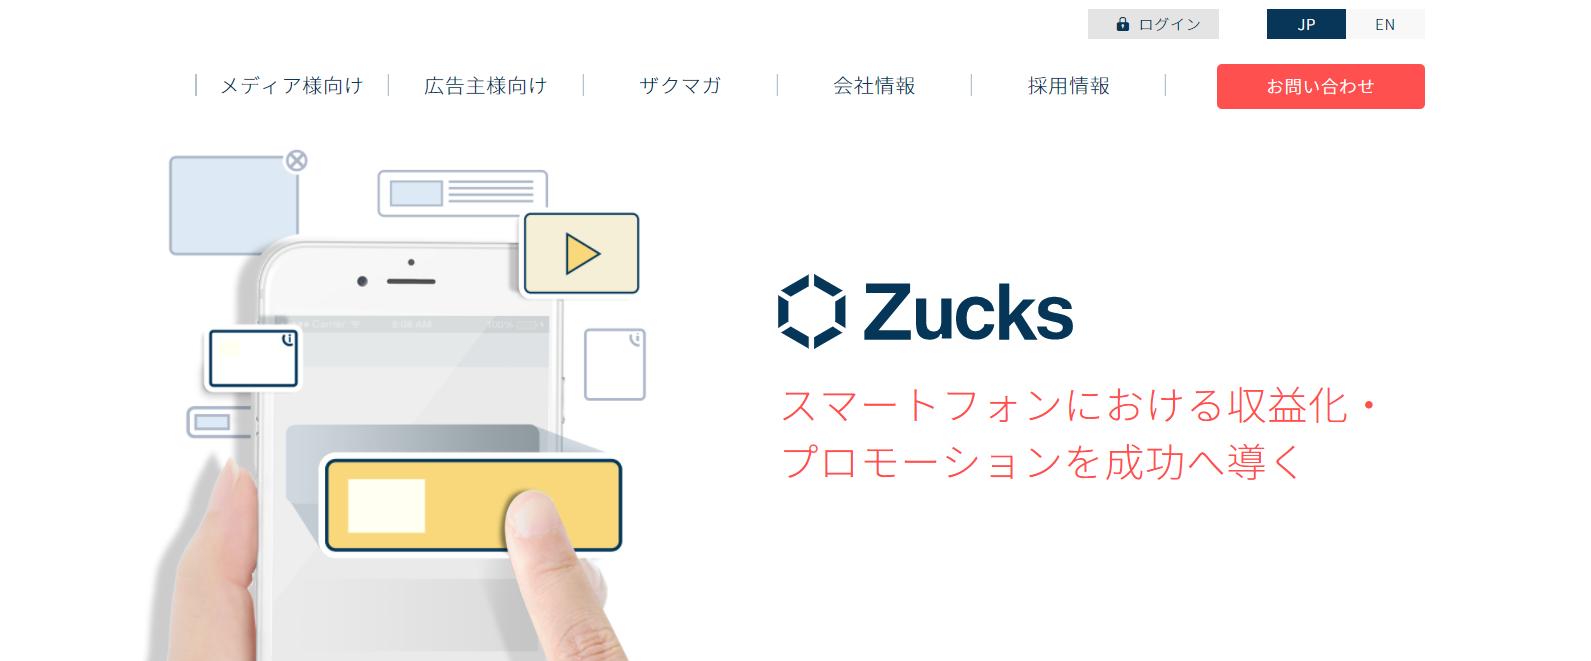 Zucks無料会員登録の方法と流れ